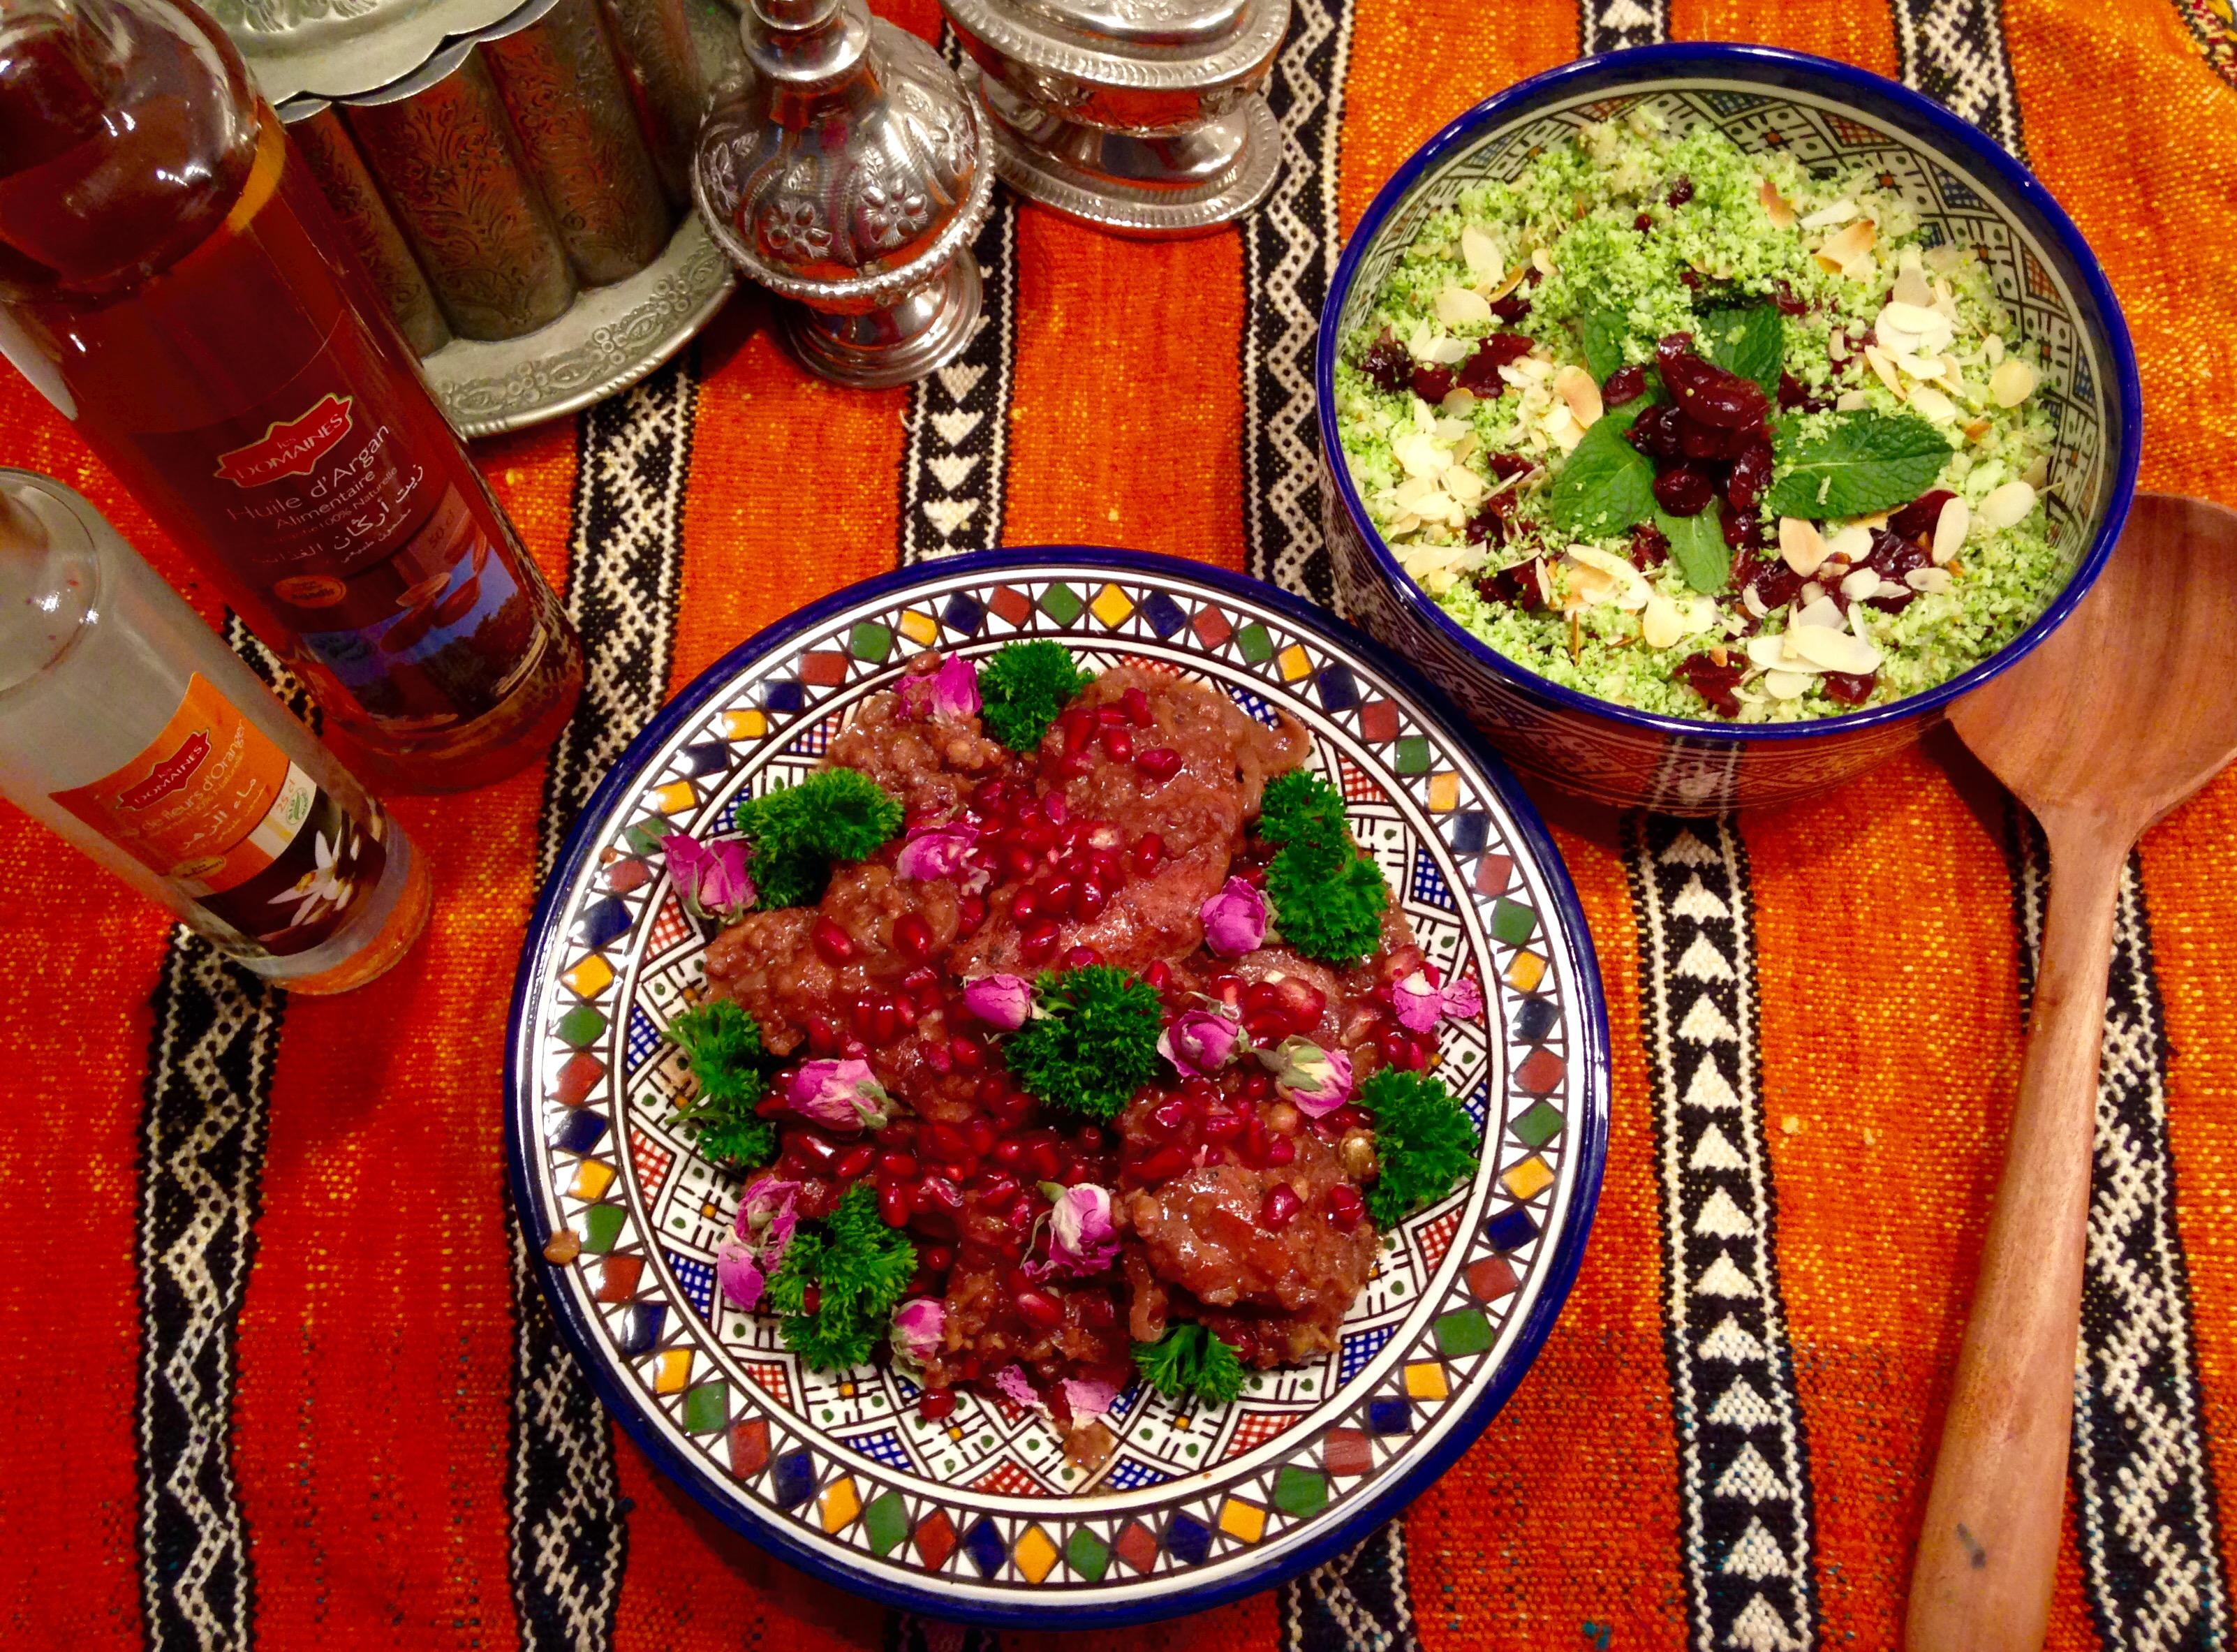 Poulet grenade et boulgour brocoli